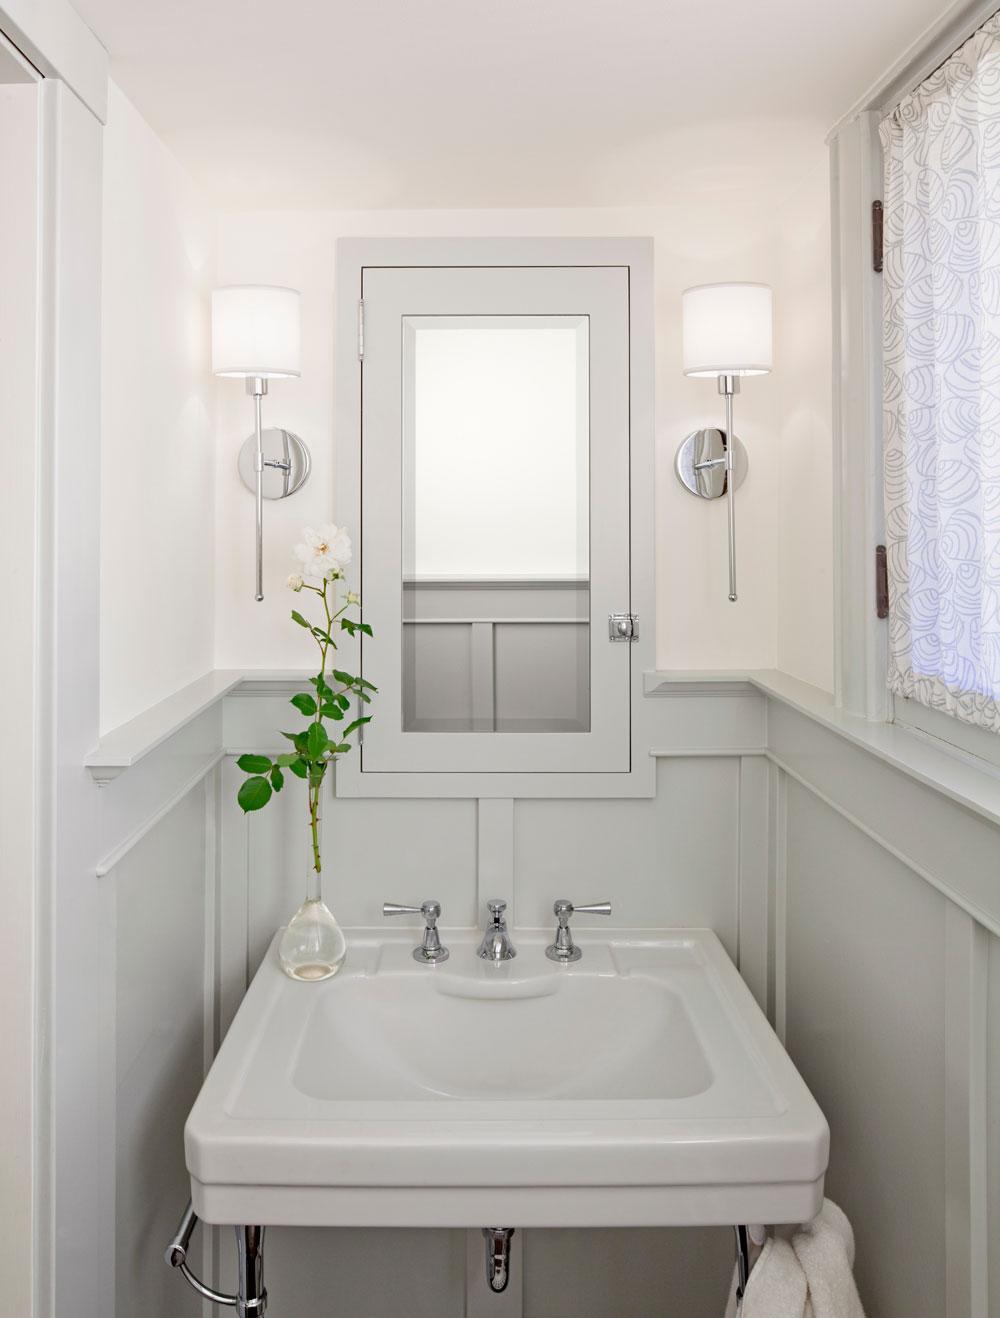 Маленькая ванная комната с панелями